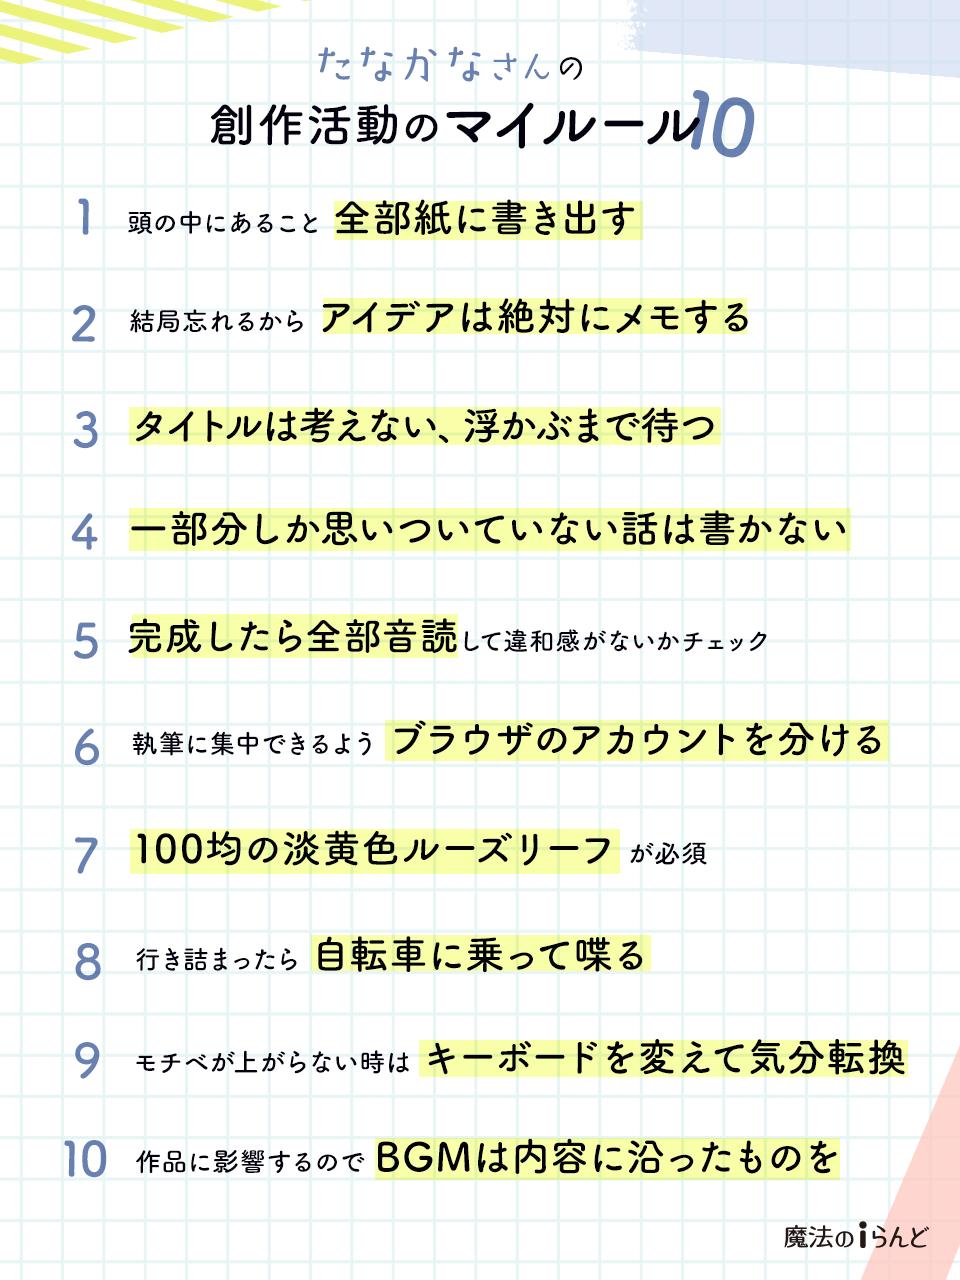 https://storage.googleapis.com/blog-info/entry/2021/08/02-myrule-tanakana_twitter.png